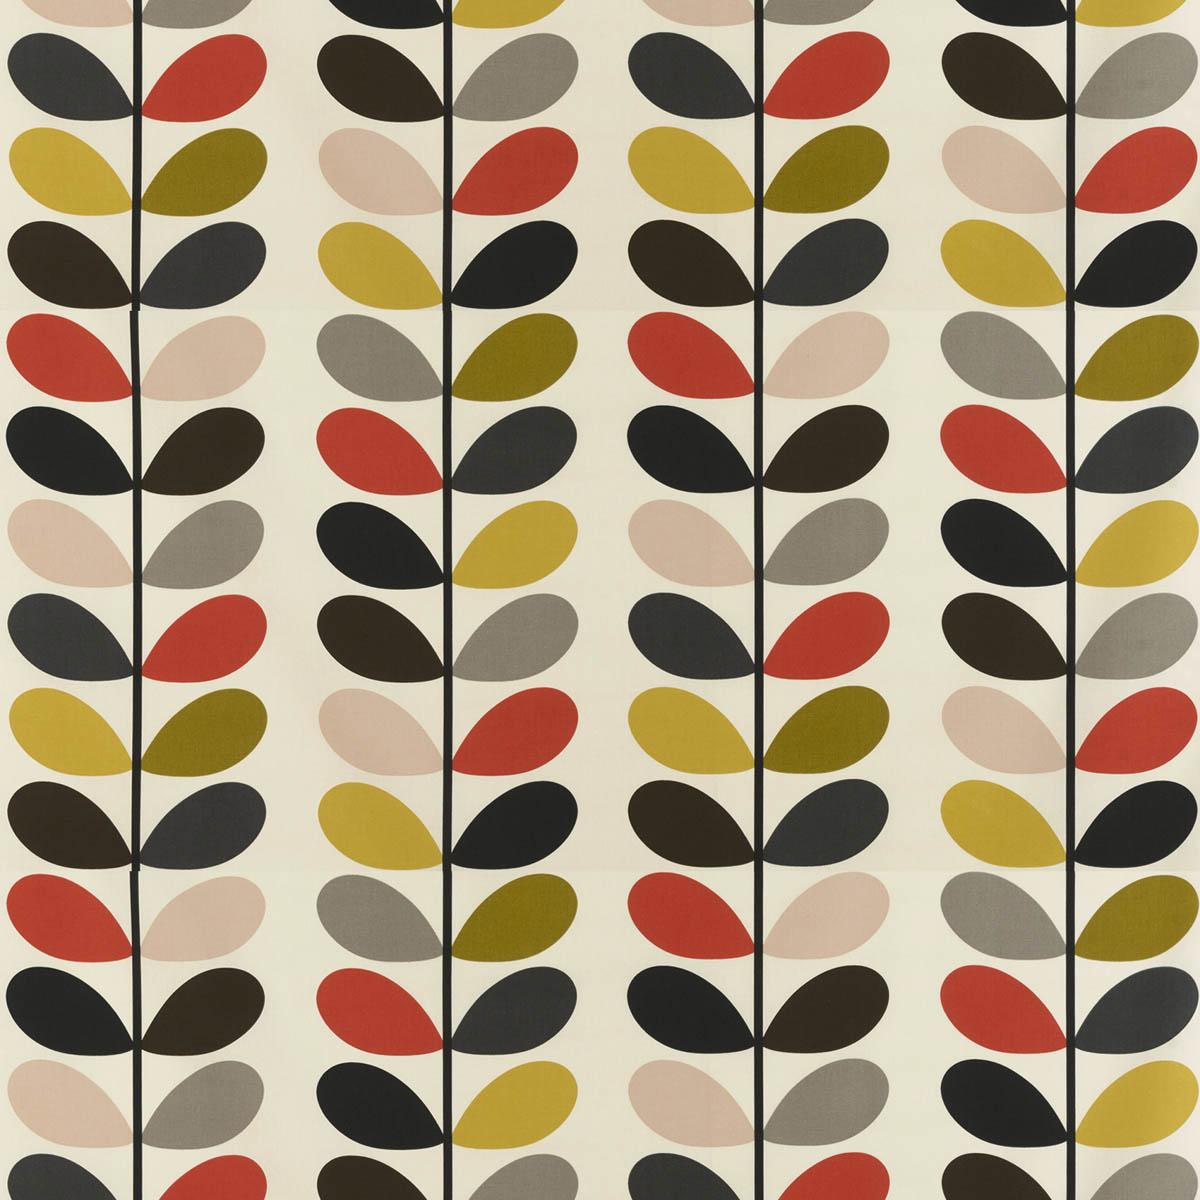 Orla Kiely Multistem Tomato Curtain Upholstery Fabric